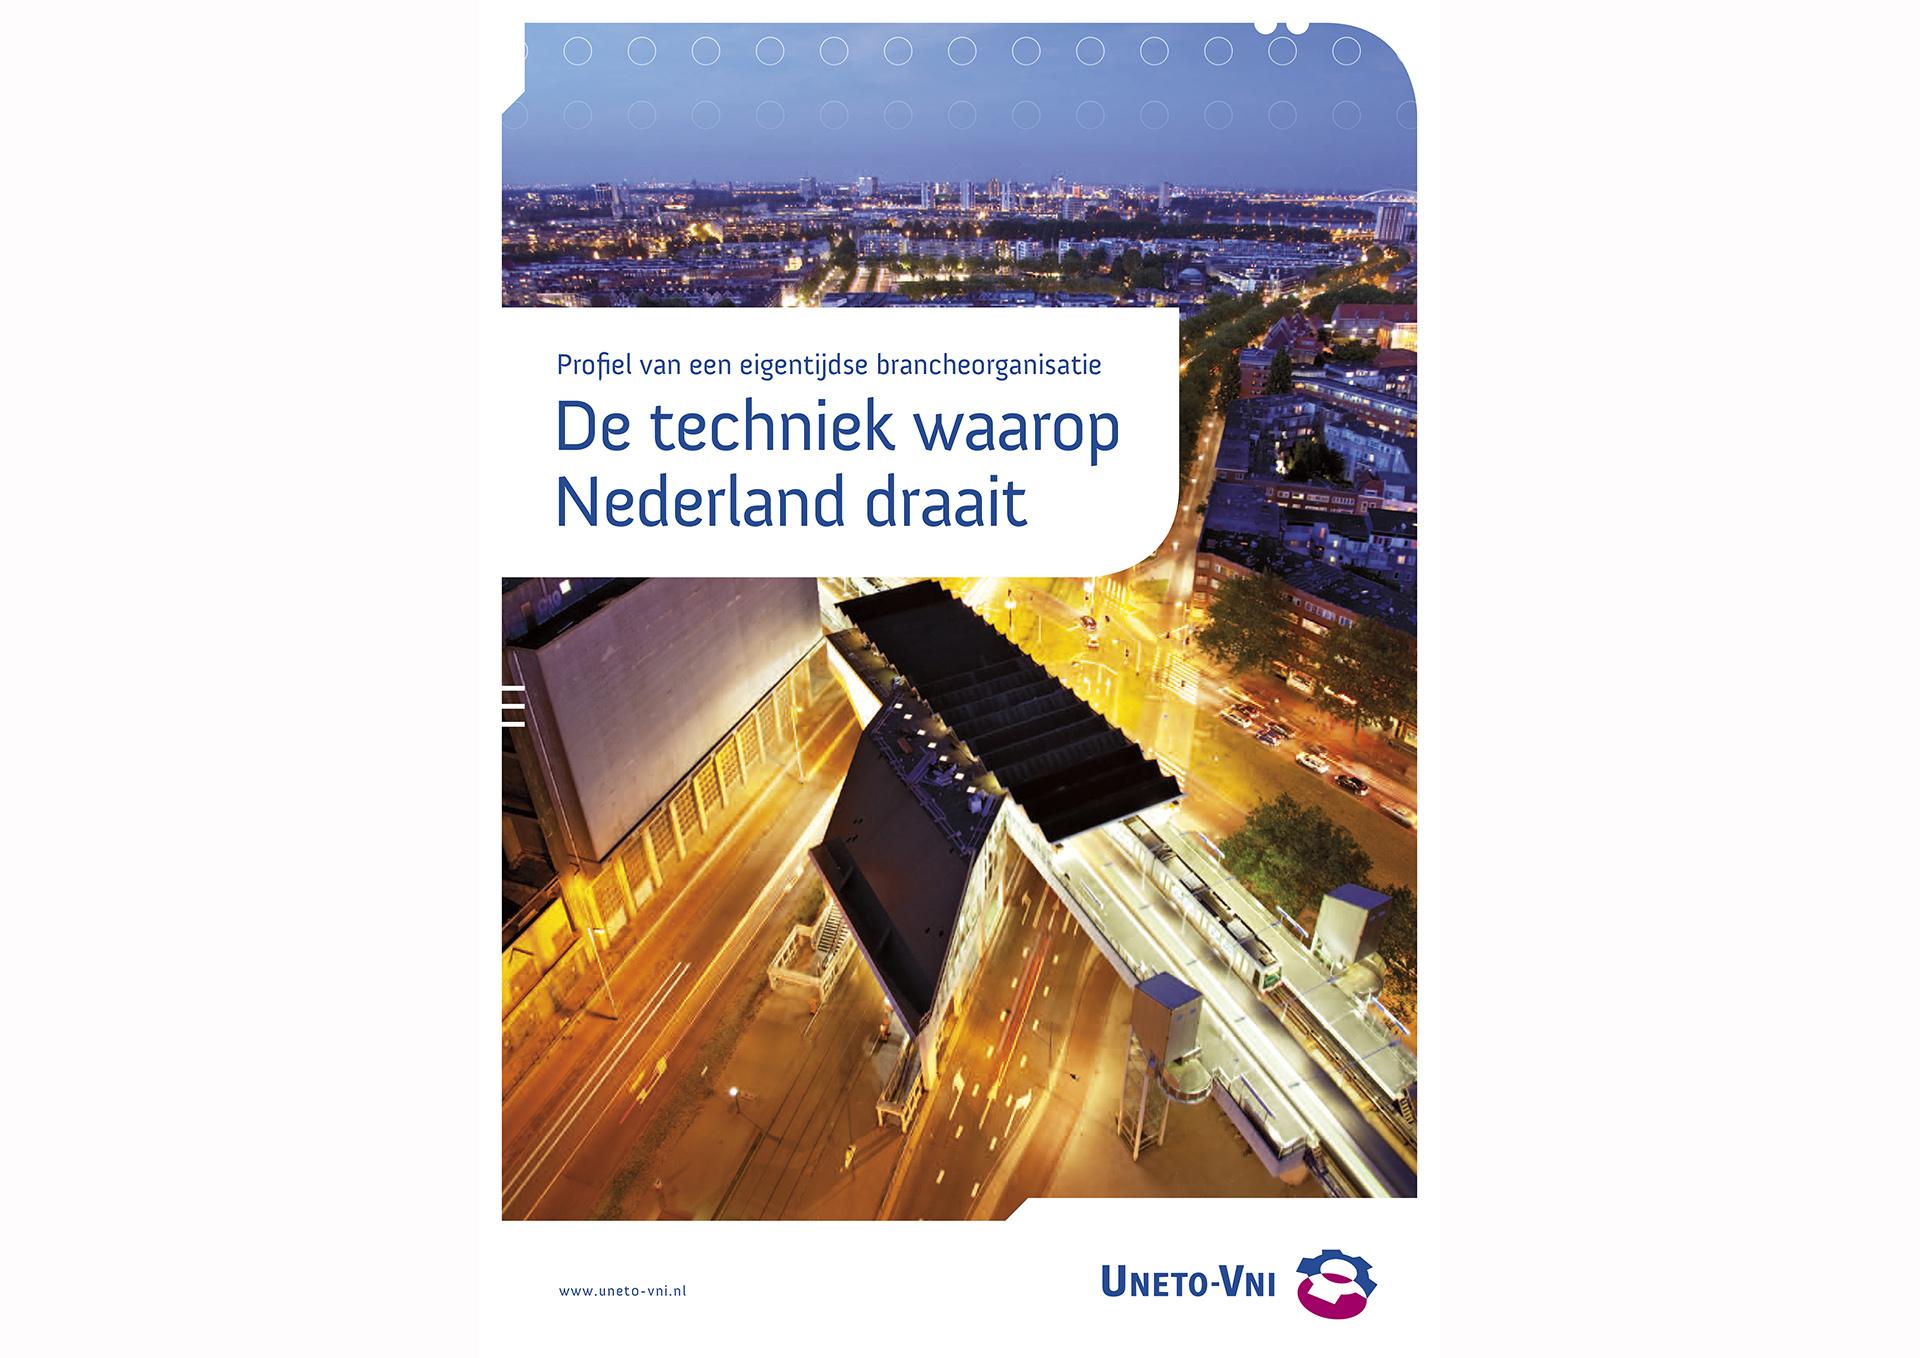 Corporate brochure -_UNETO-VNI(1)-1a.jpg